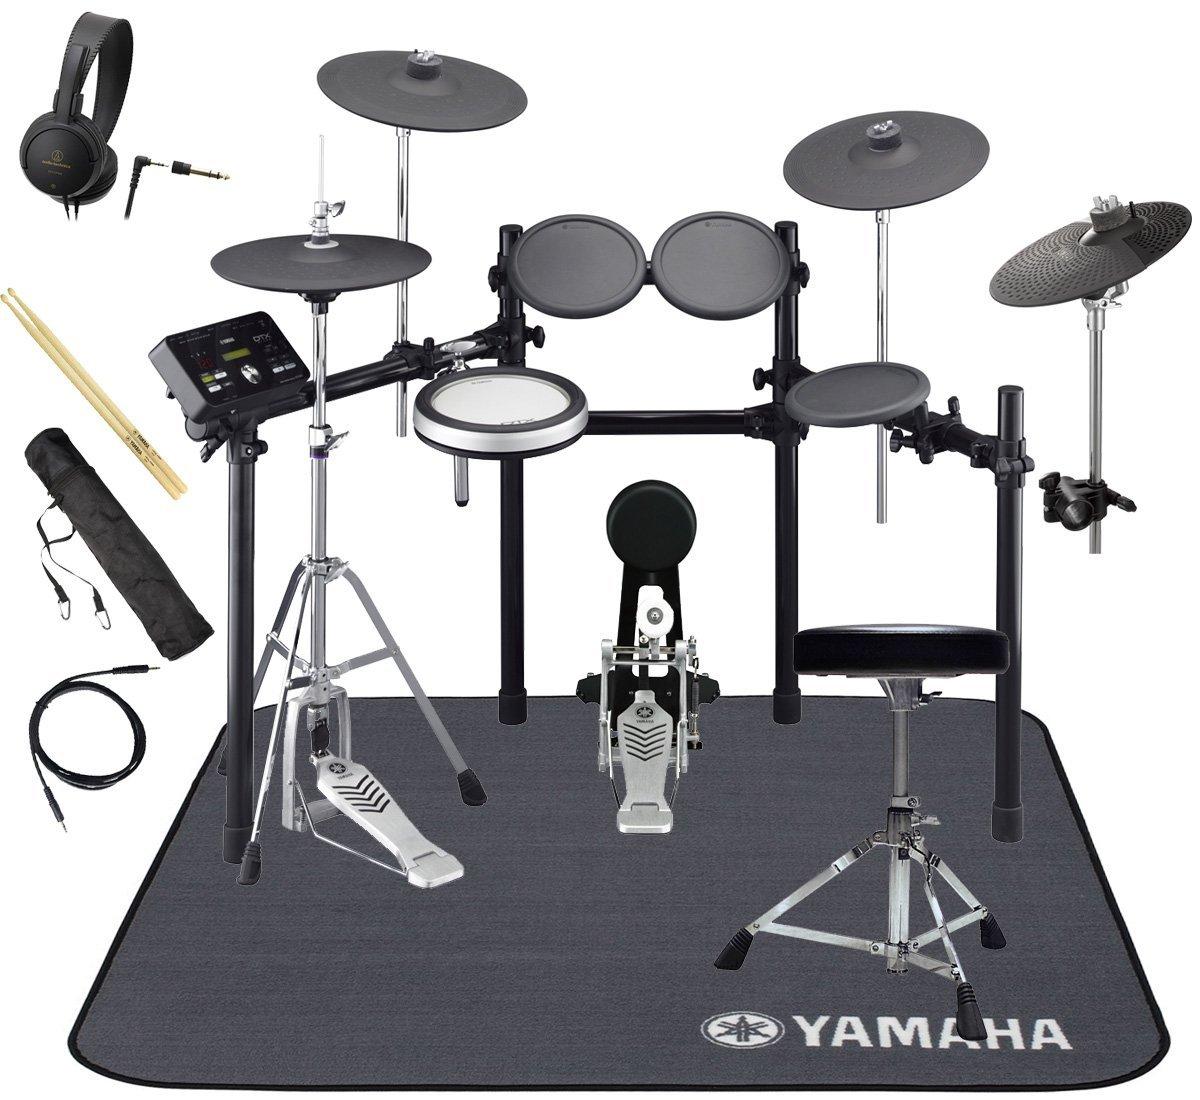 YAMAHA 電子ドラム DTX532KFS 3シンバル オリジナルスターターパック 純正マットセット   B07G12VTSS